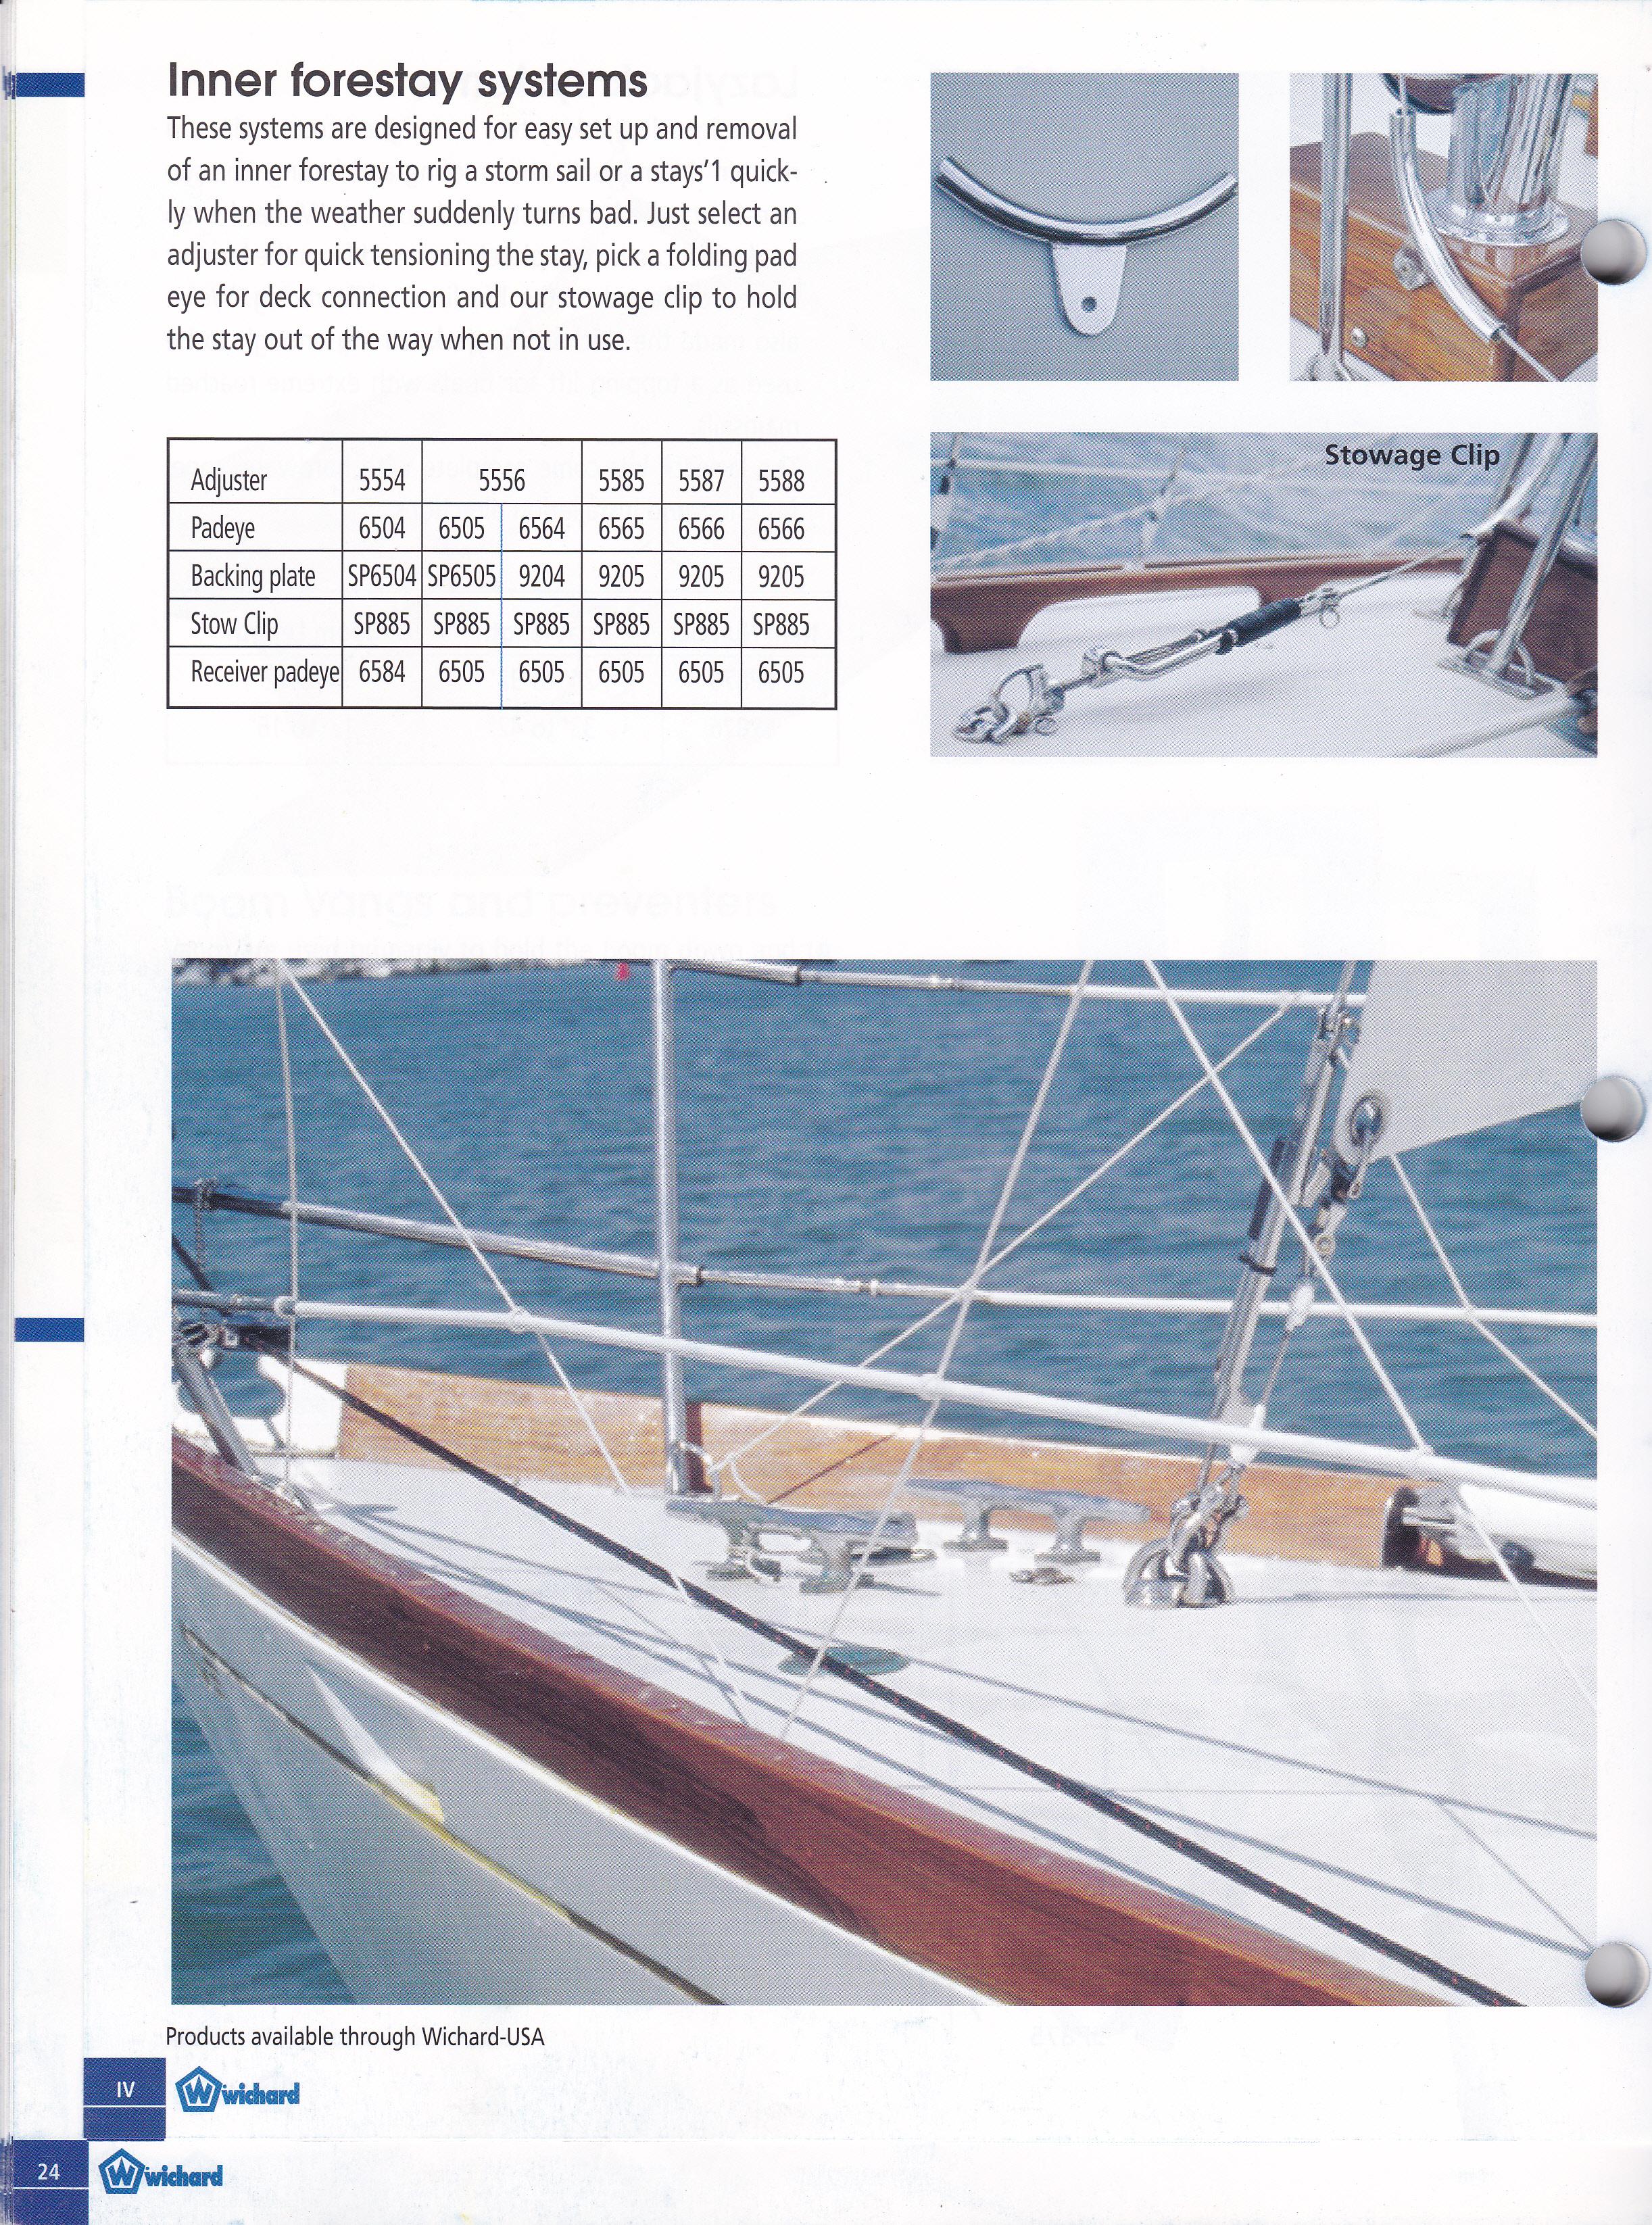 H14 Turbo Conversion ~ BeachCat Sailing - Midwest